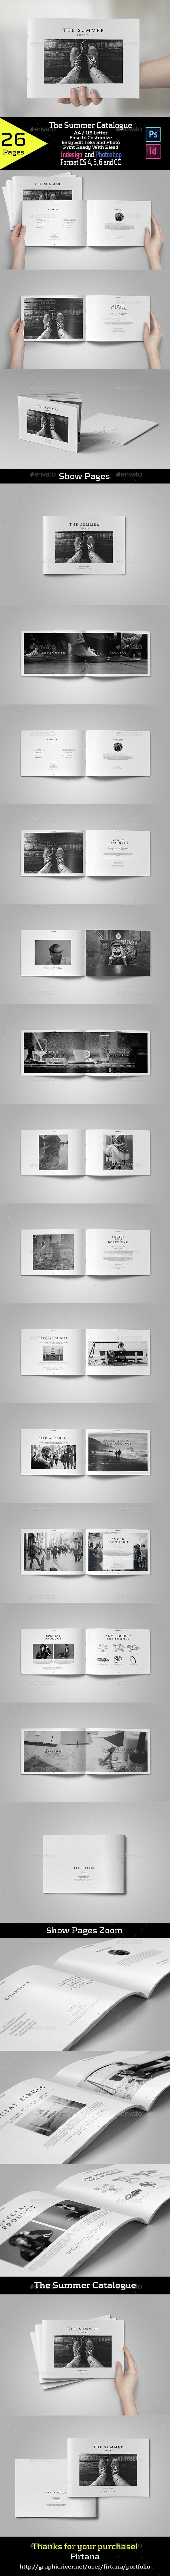 The Summer Catalogue - Catalogs Brochures